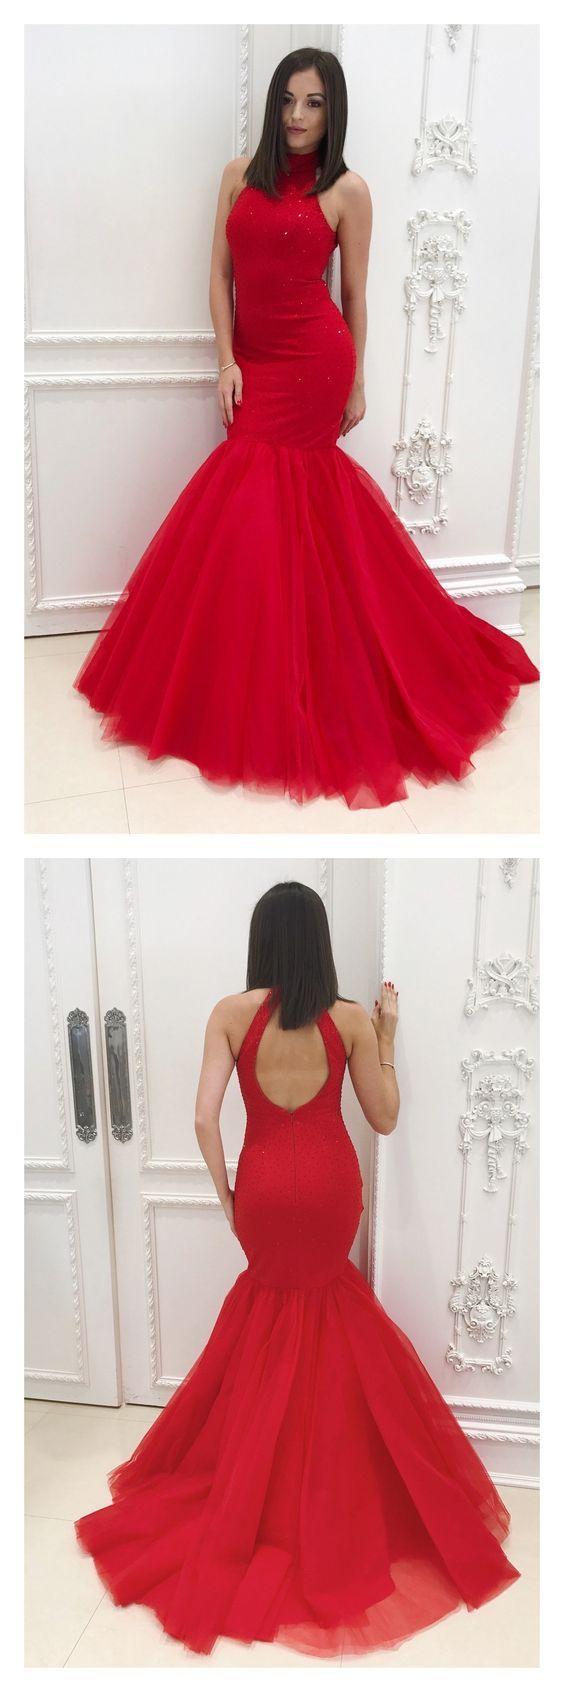 Red halter long tulle mermaid prom dresses pl mermaid